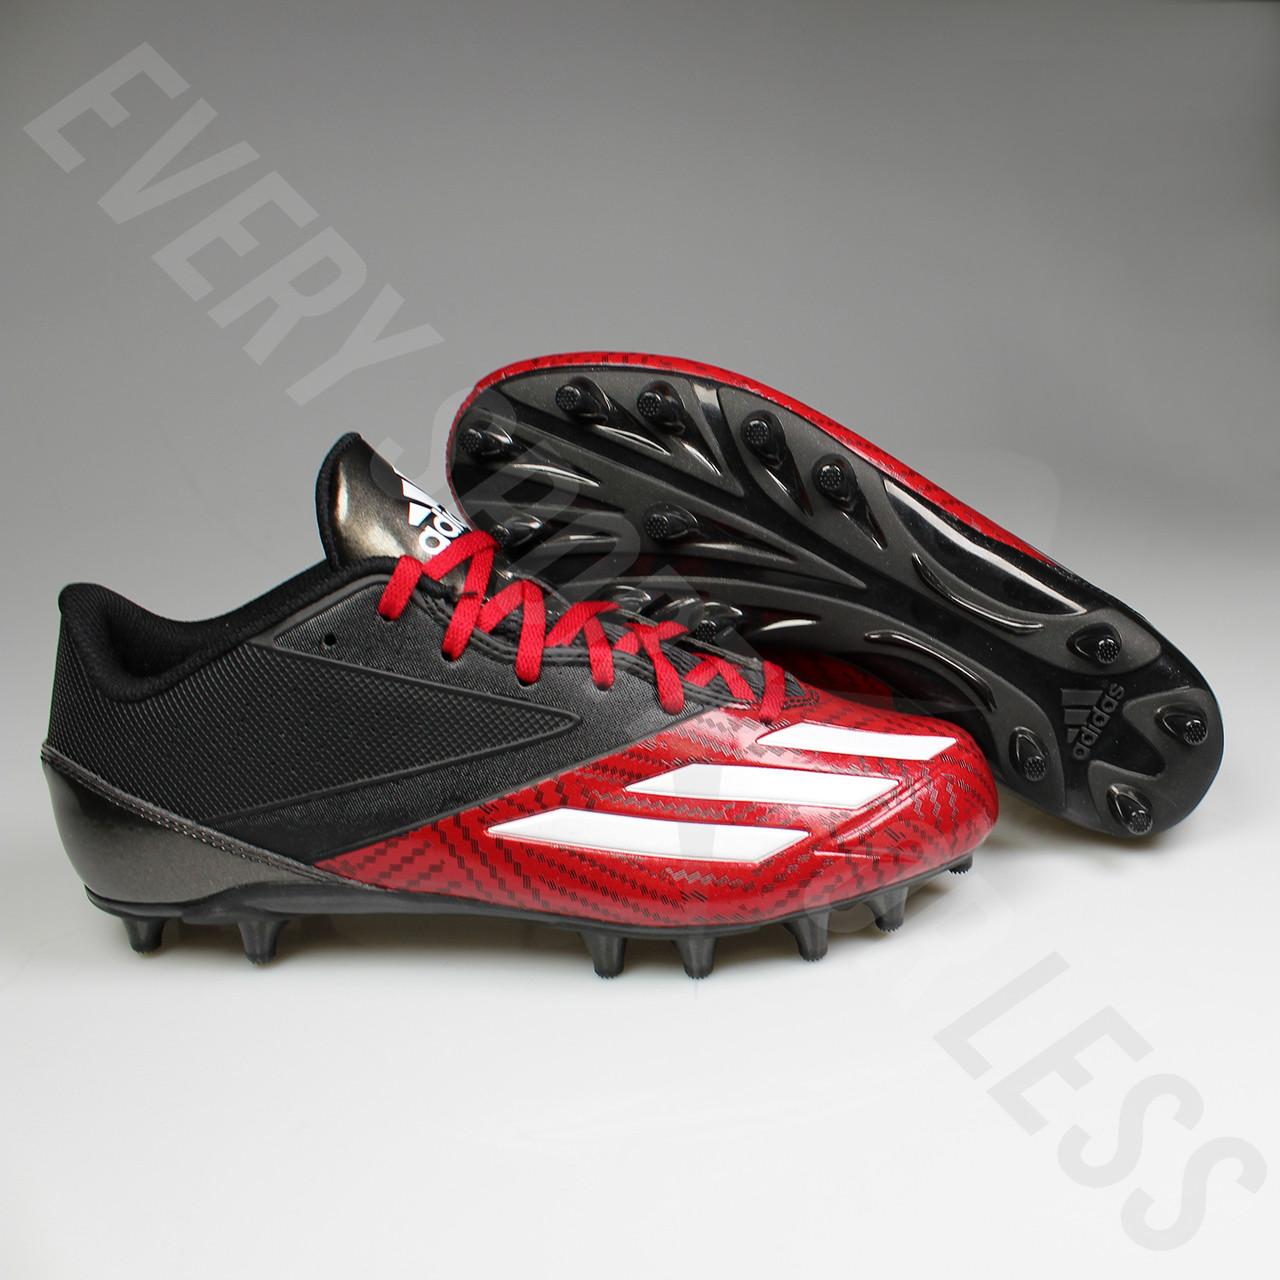 19ebcb1be87 ... Adidas Adizero 5-Star Low Football Lacrosse Cleats D70176 - Black